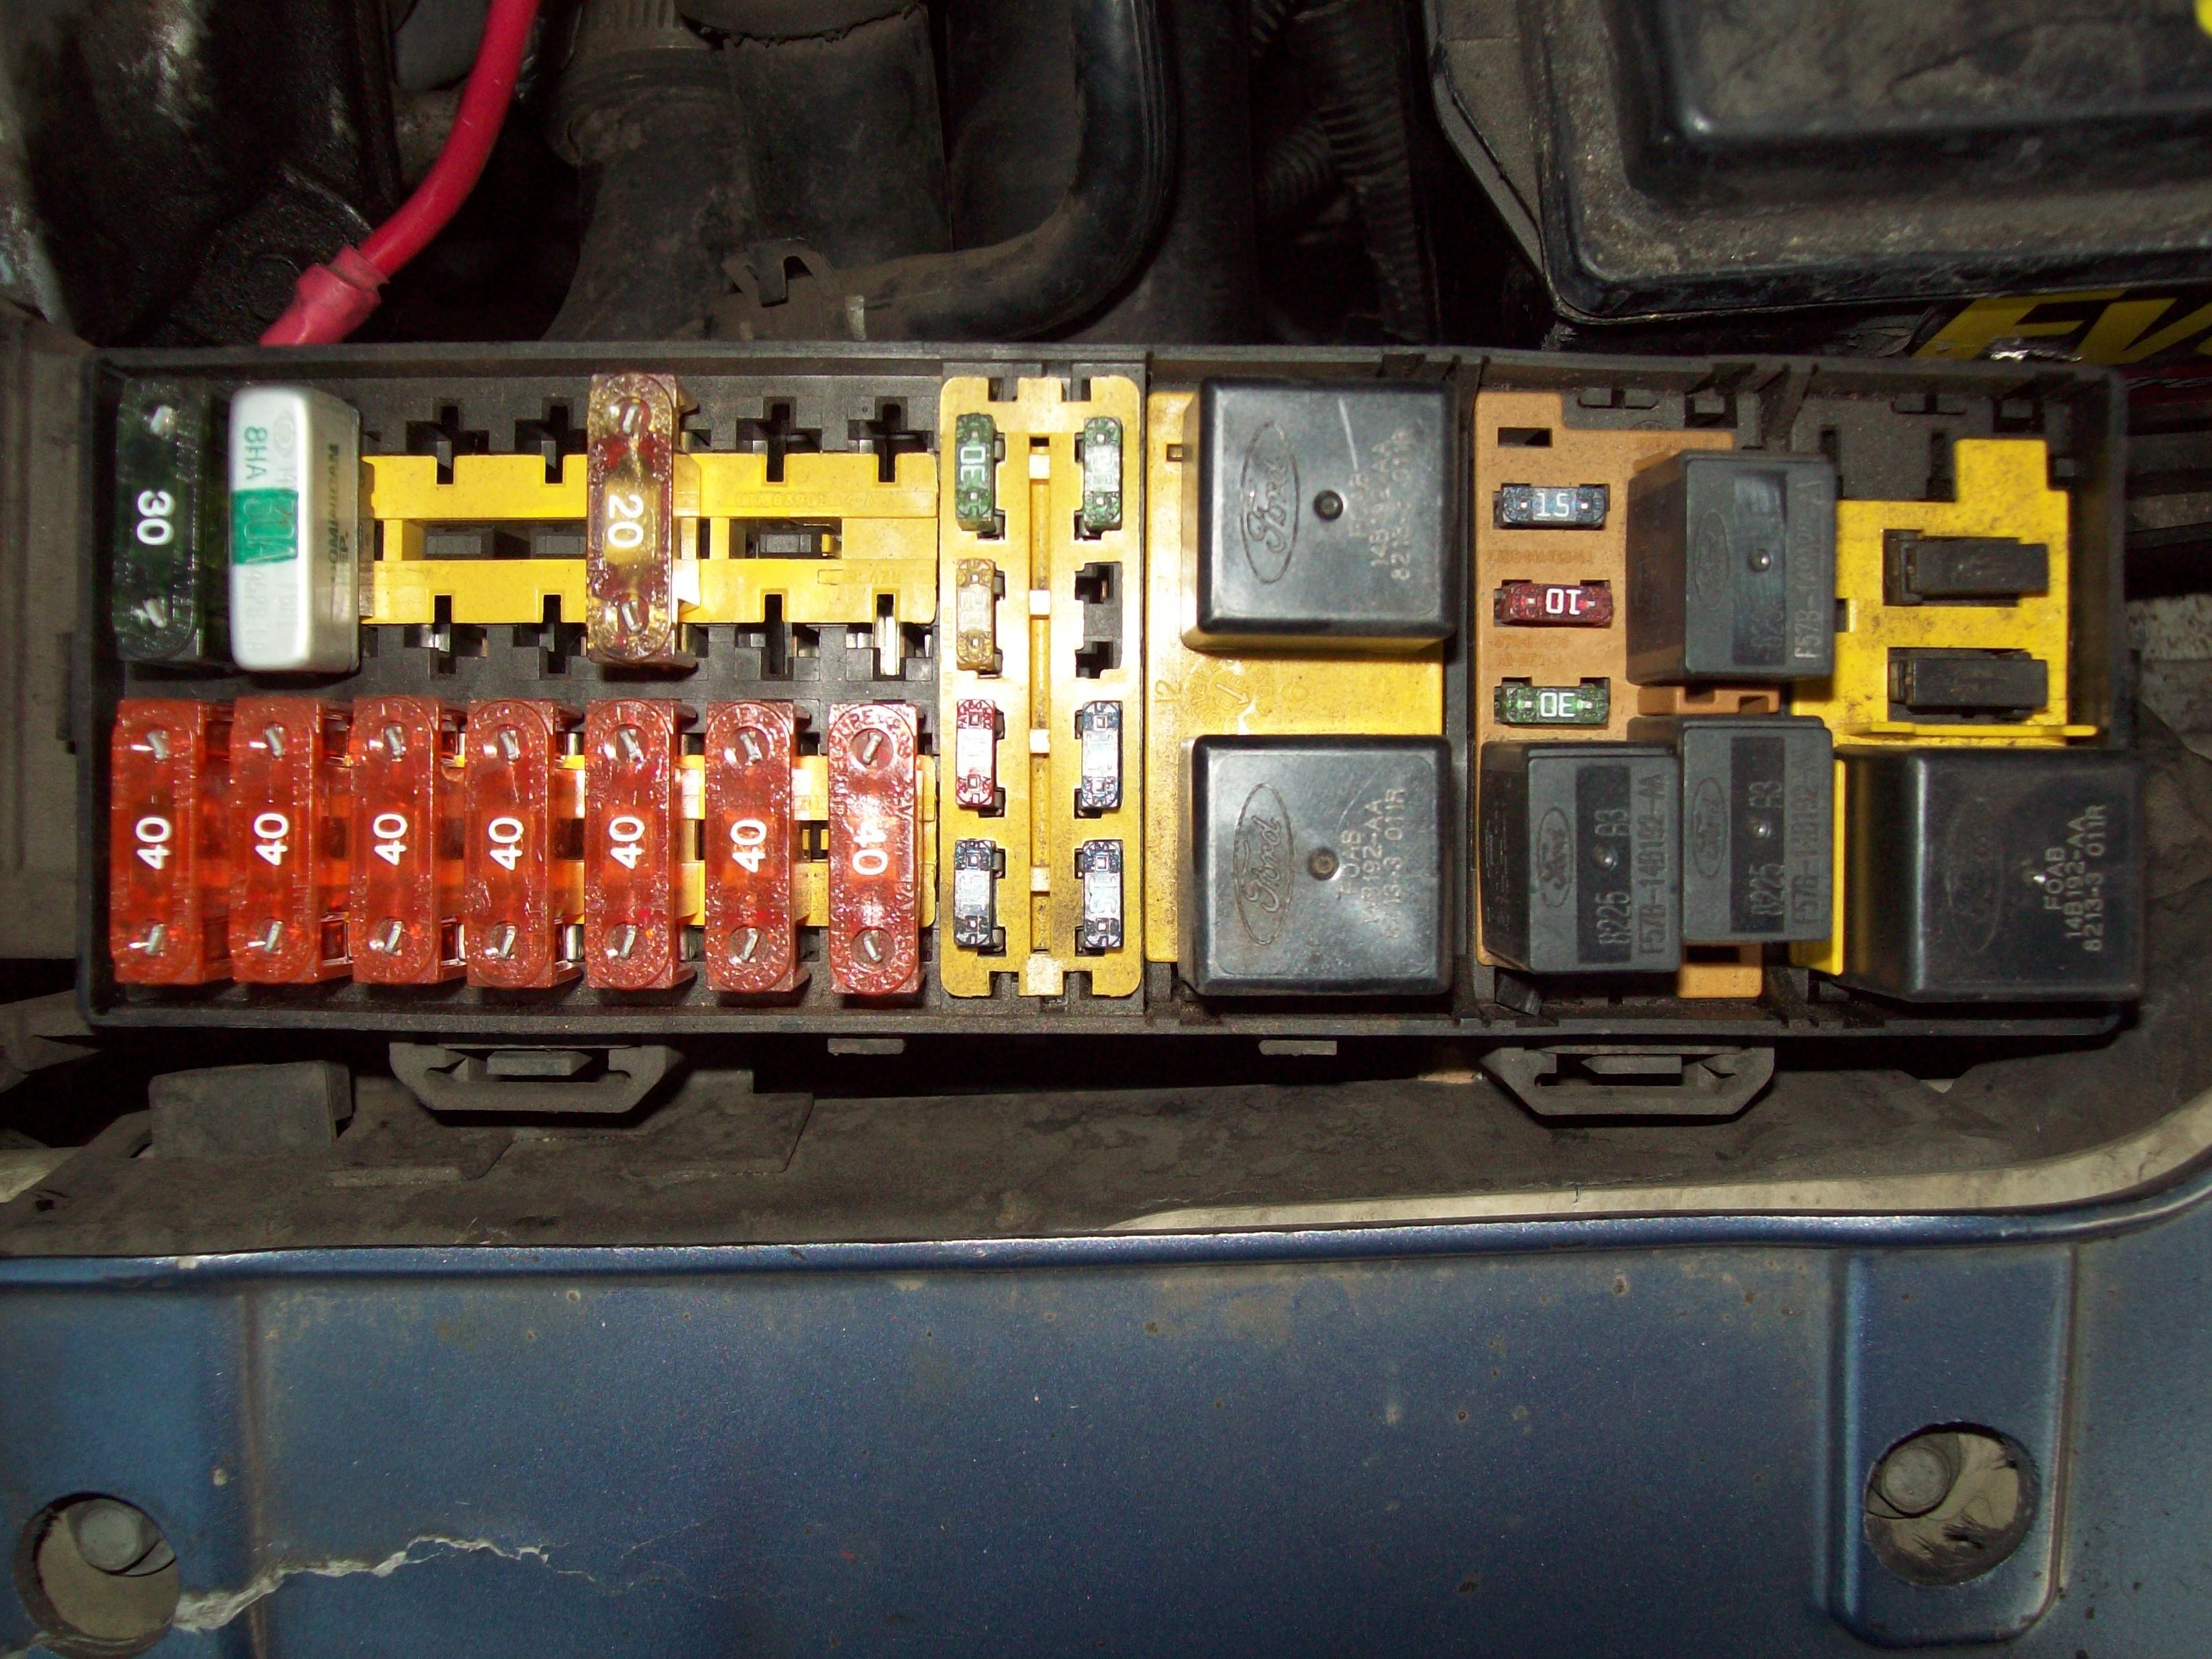 1999 taurus fuse box diagram wiring 2 switches 1 light 2006 bmw 325i pcv valve location free engine image